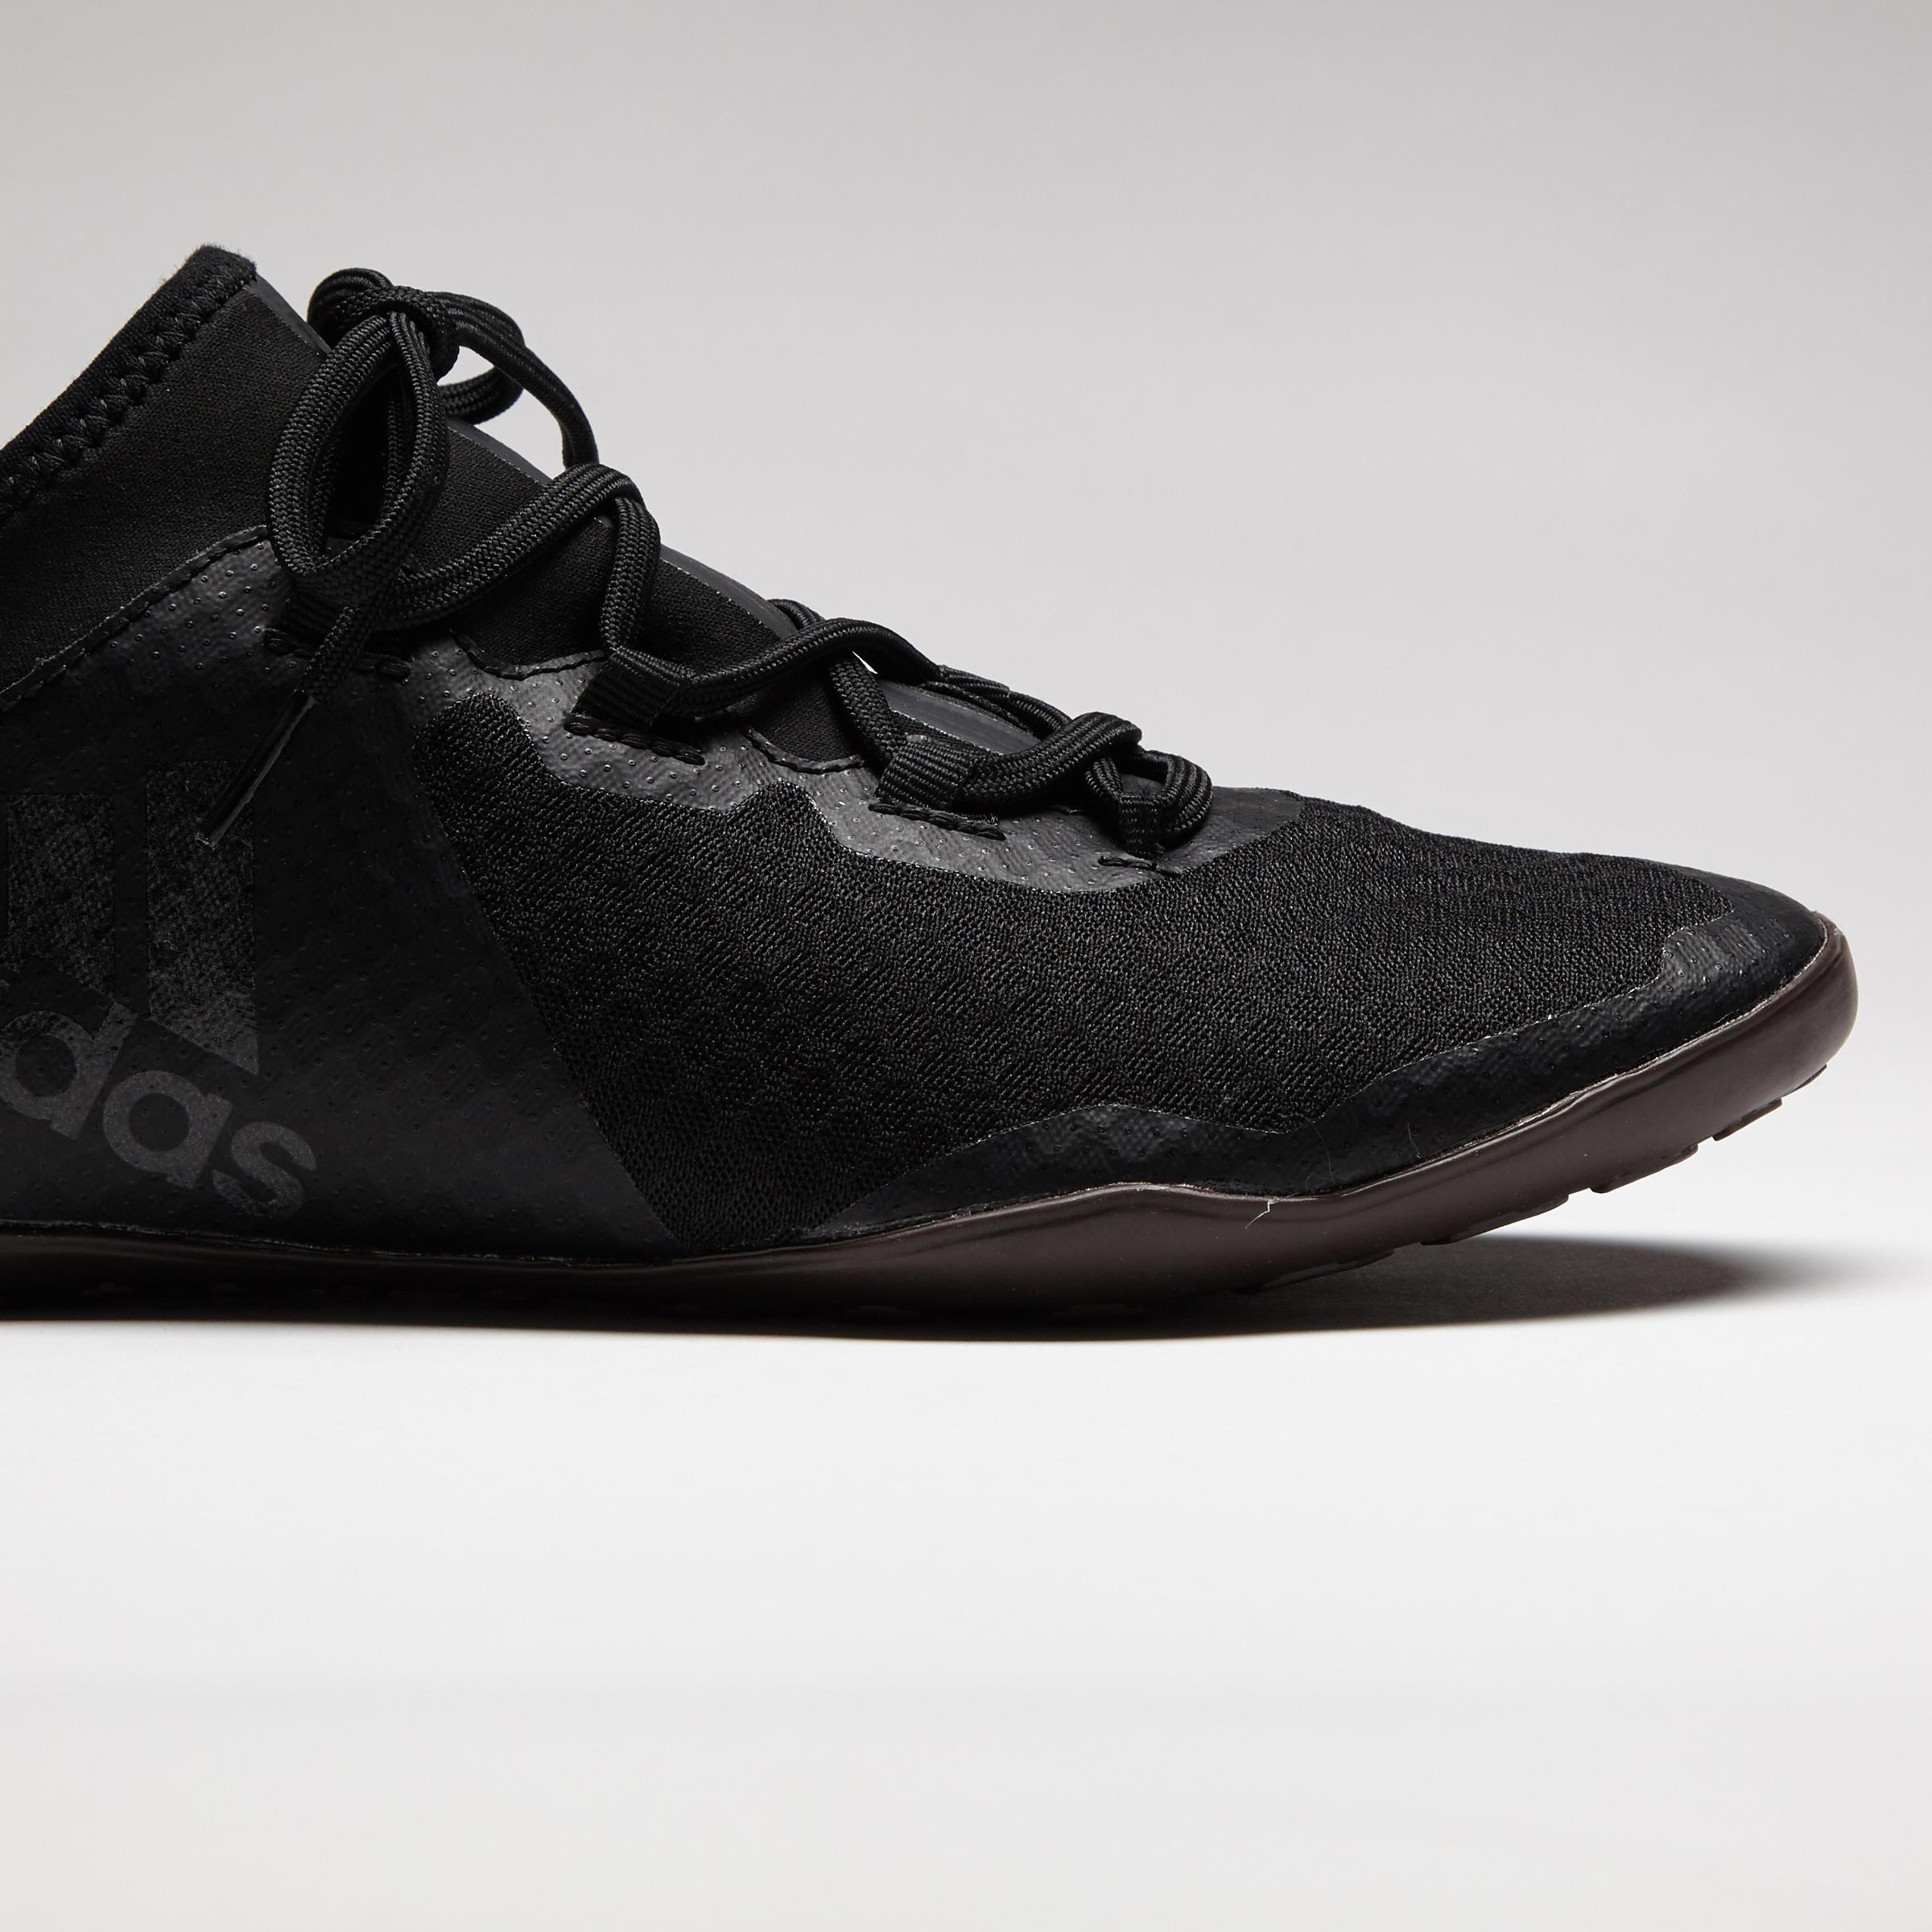 chaussure de futsal adulte x tango 17.3 noire adidas